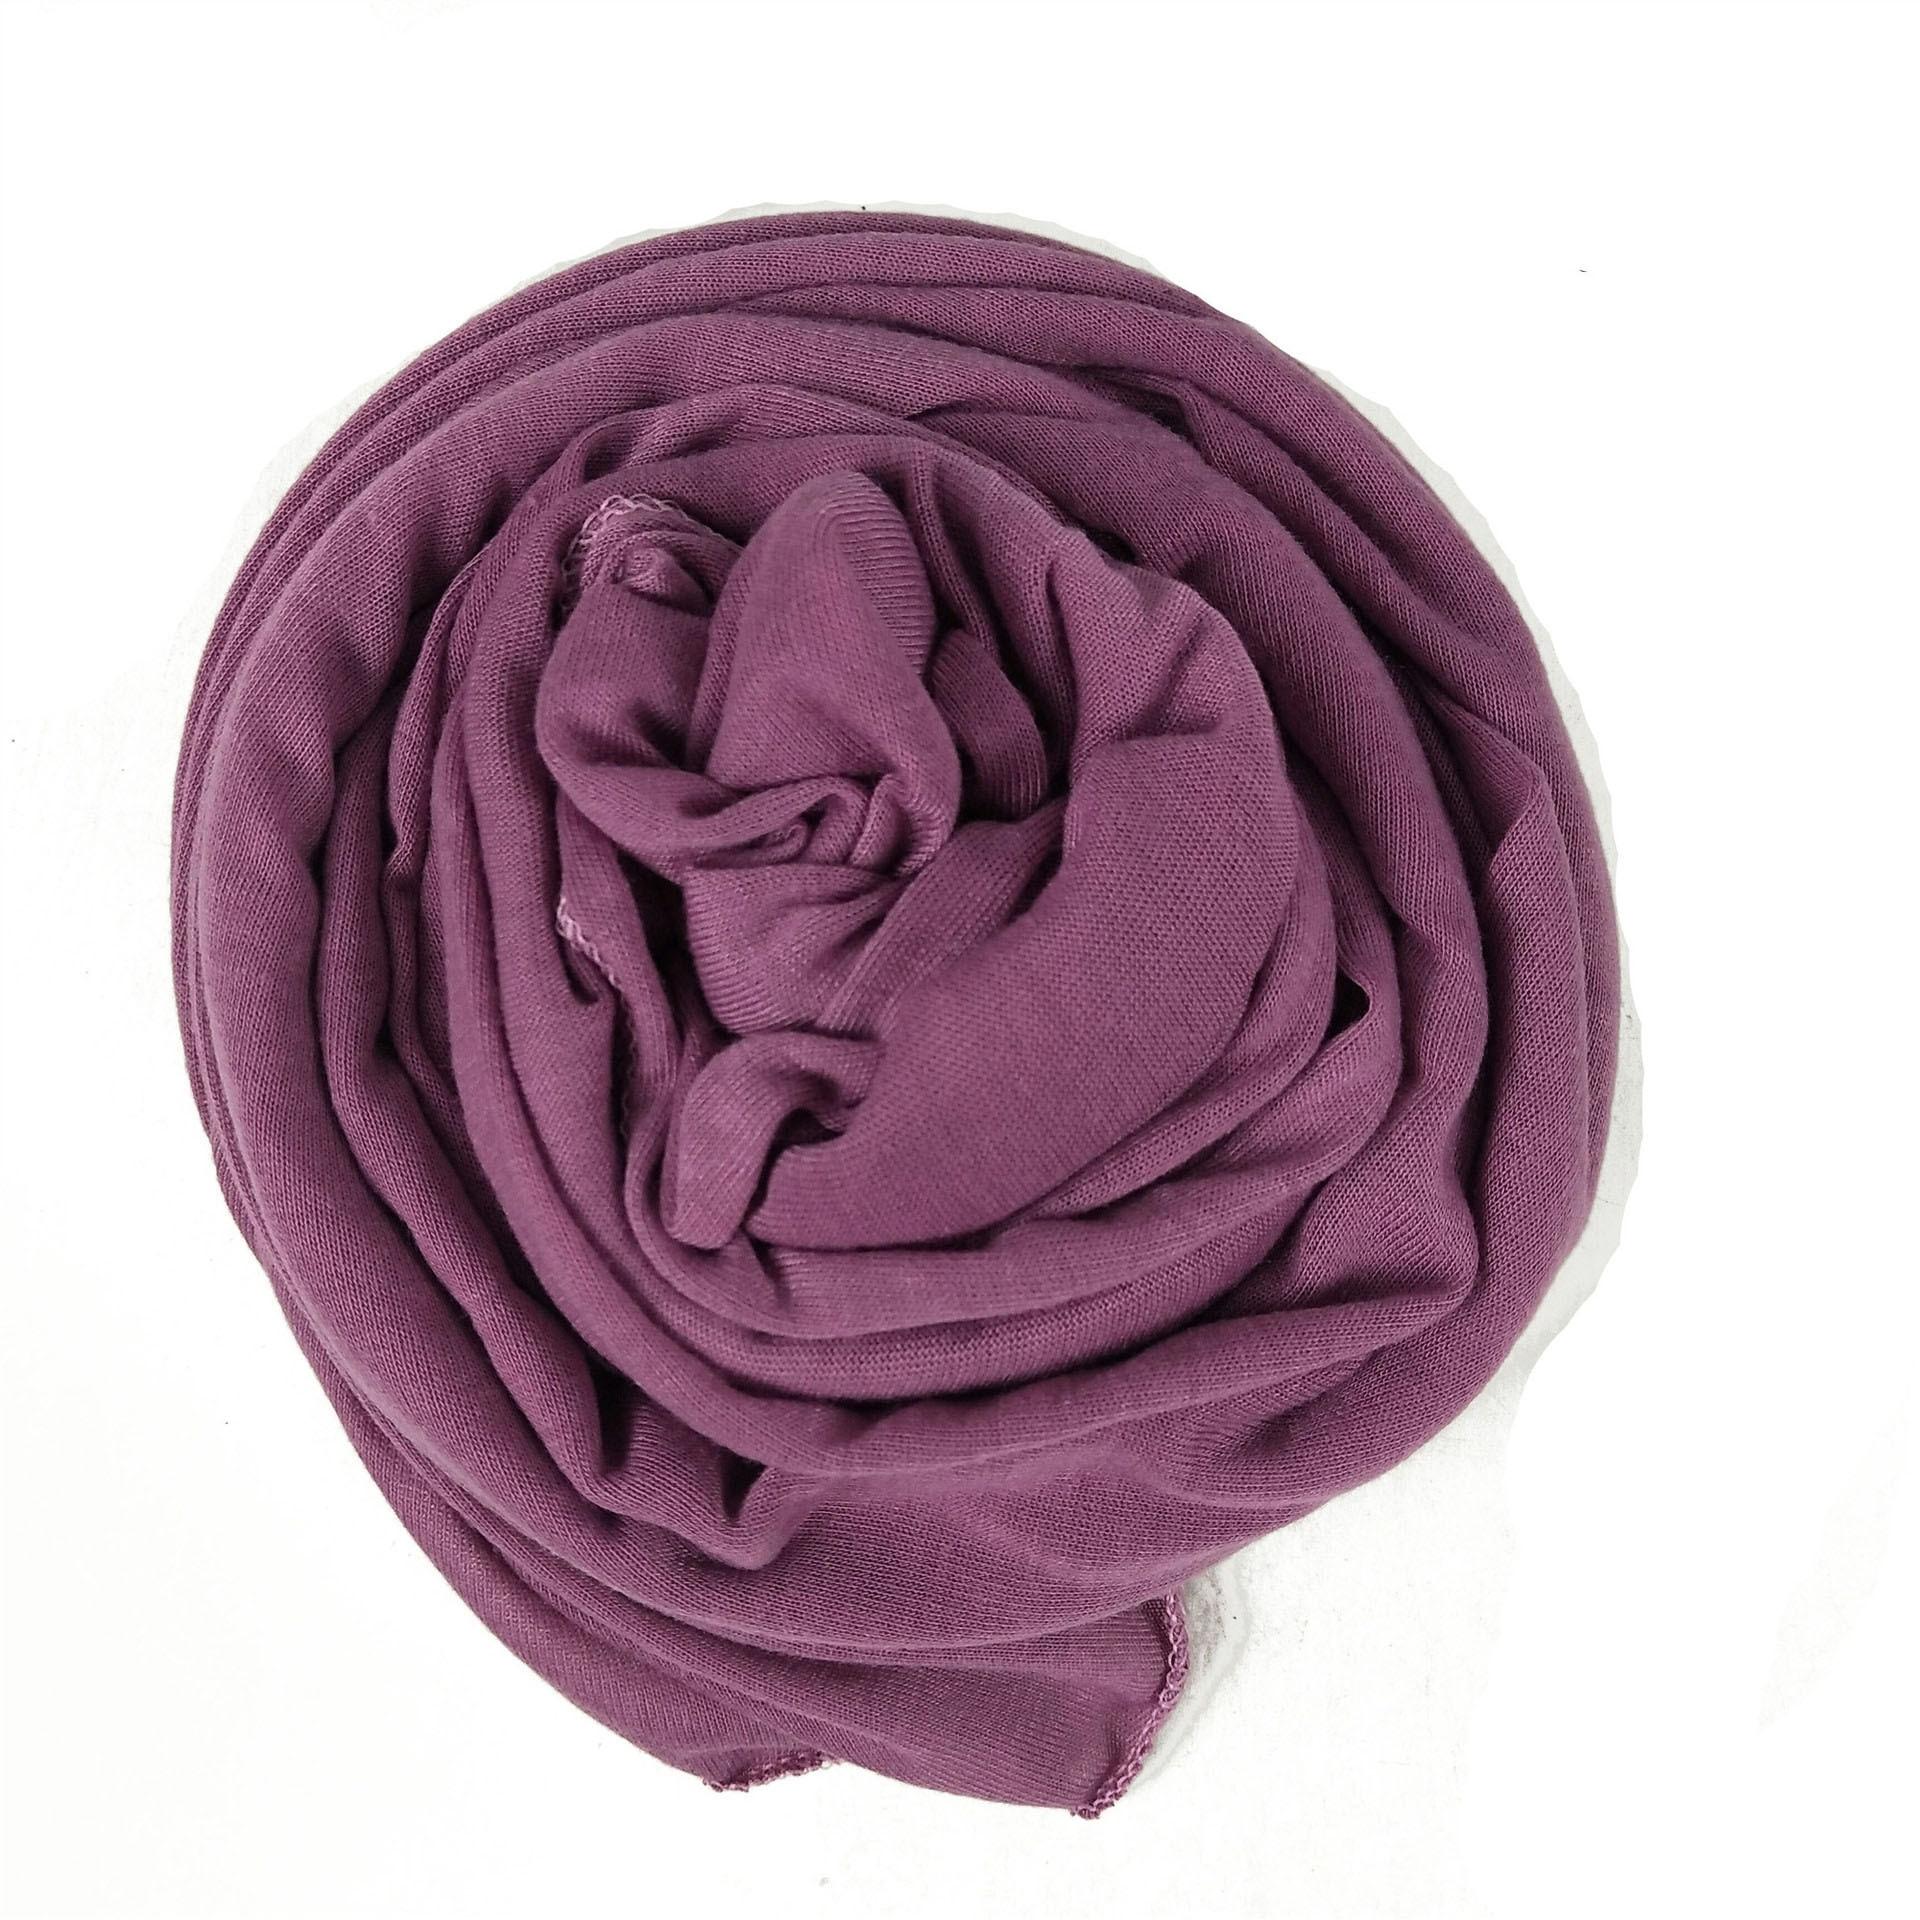 Ha 1pcs Fashion Modal Cotton Jersey Hijab Scarf Long Muslim Shawl Plain Soft Turban Tie Head Wraps For Women Africa Headband